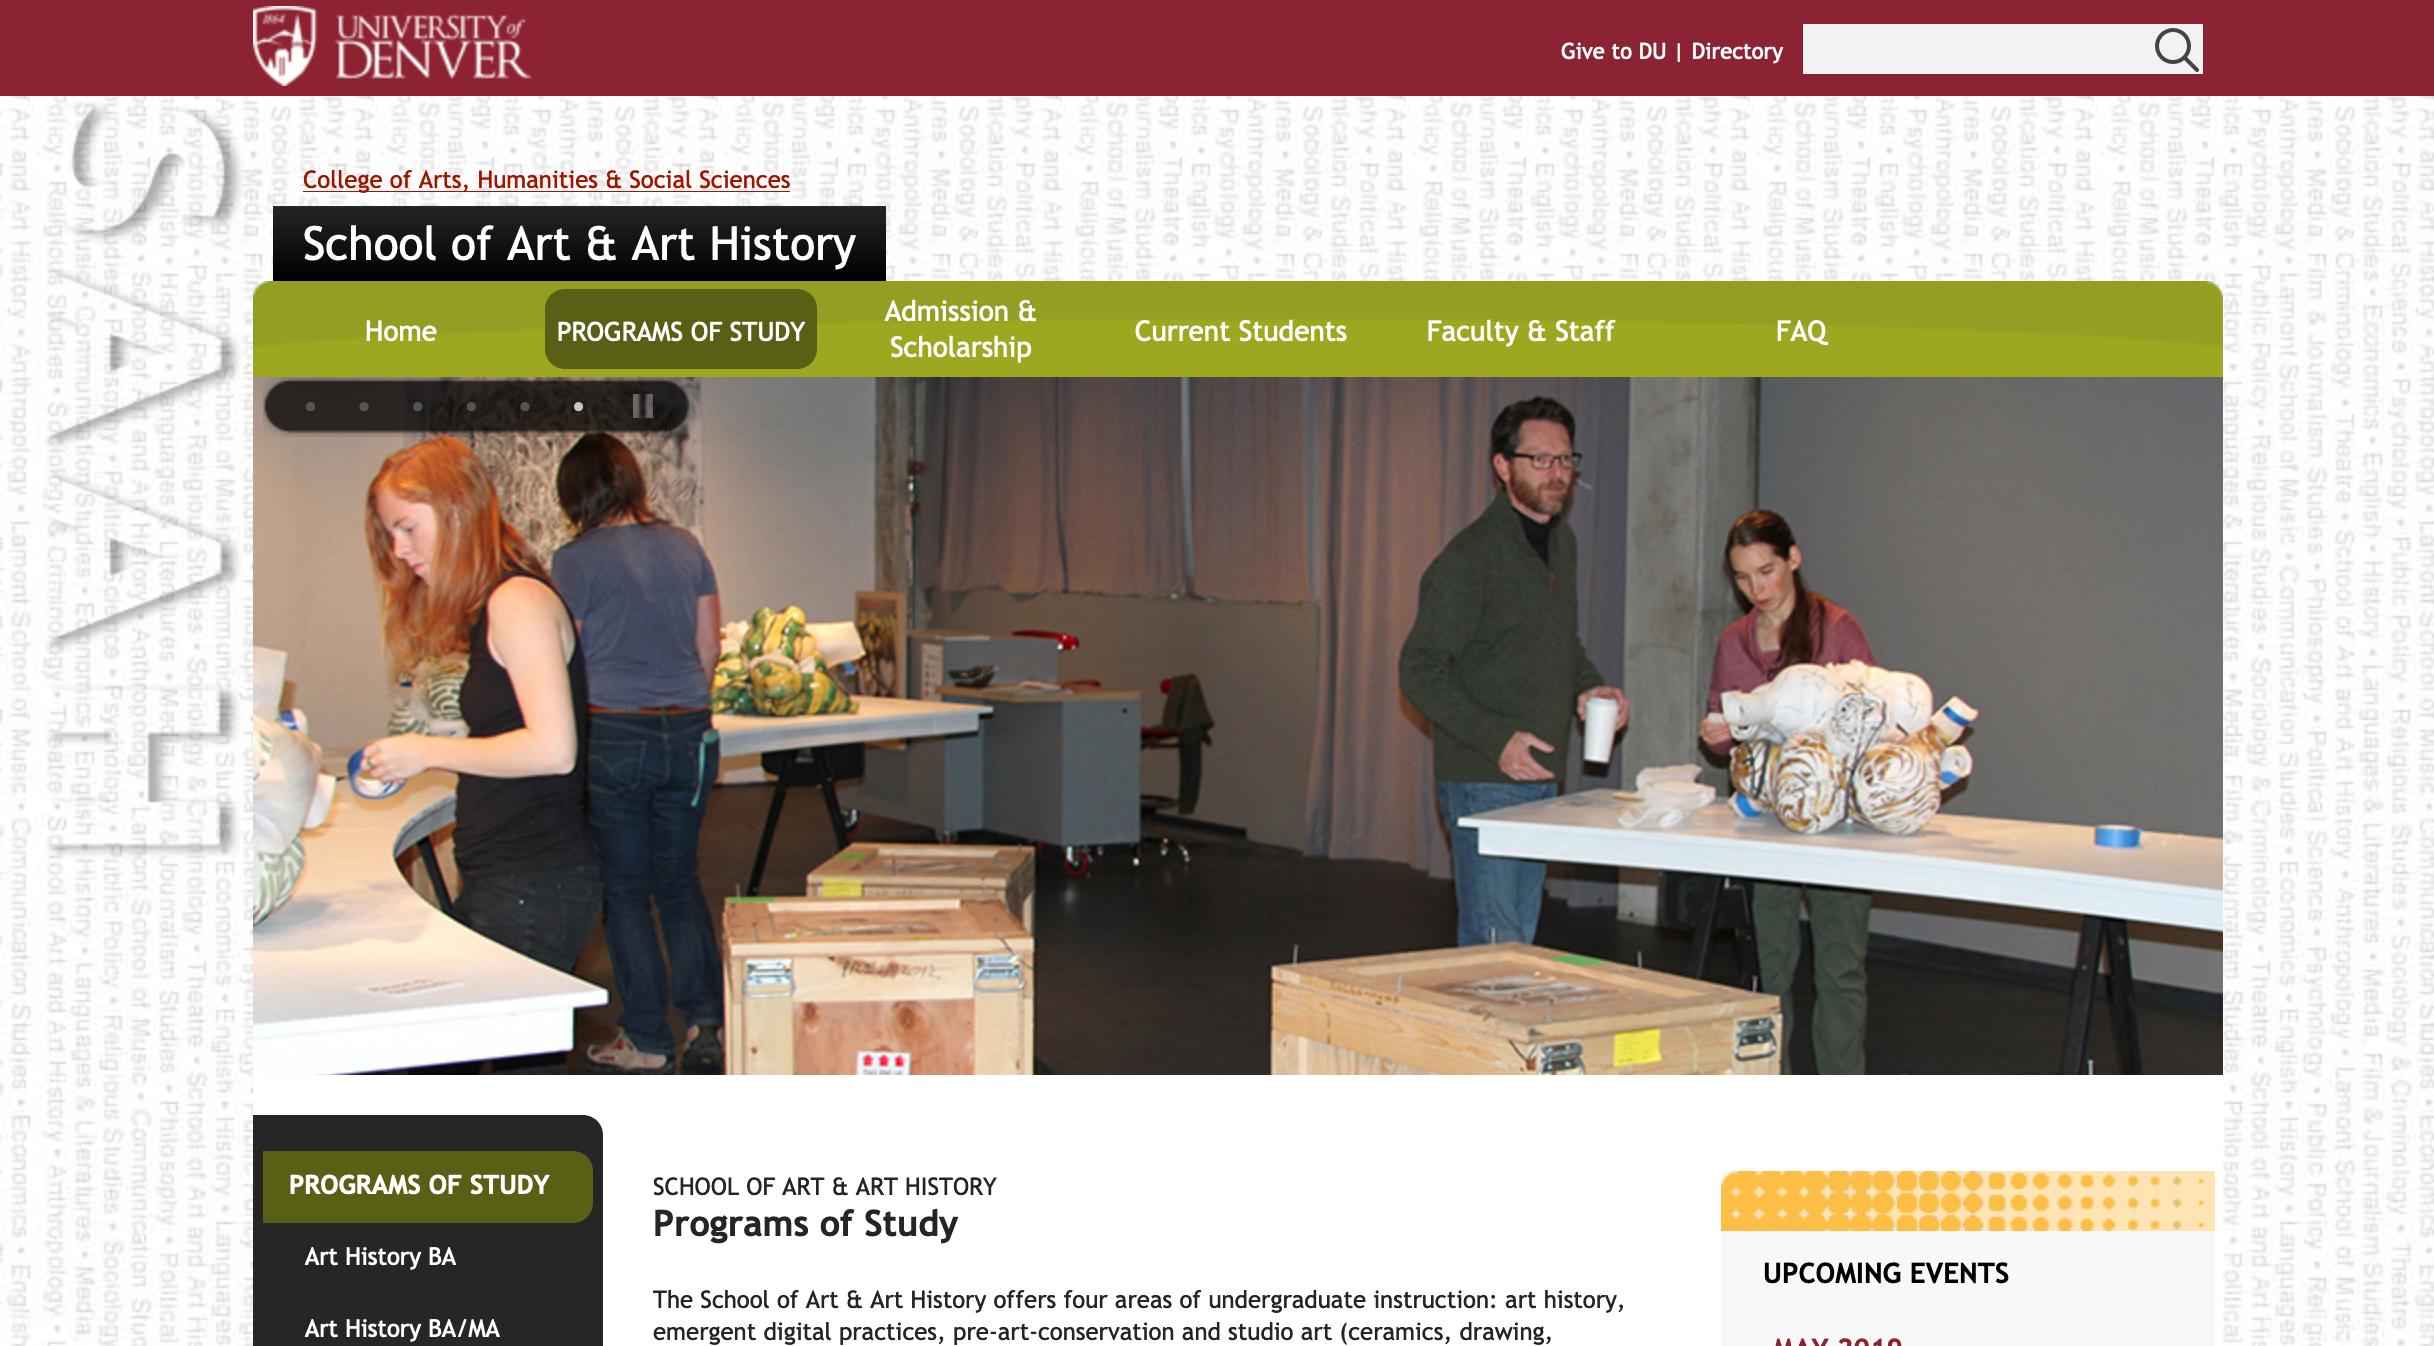 University of Denver Fine Arts website screenshot